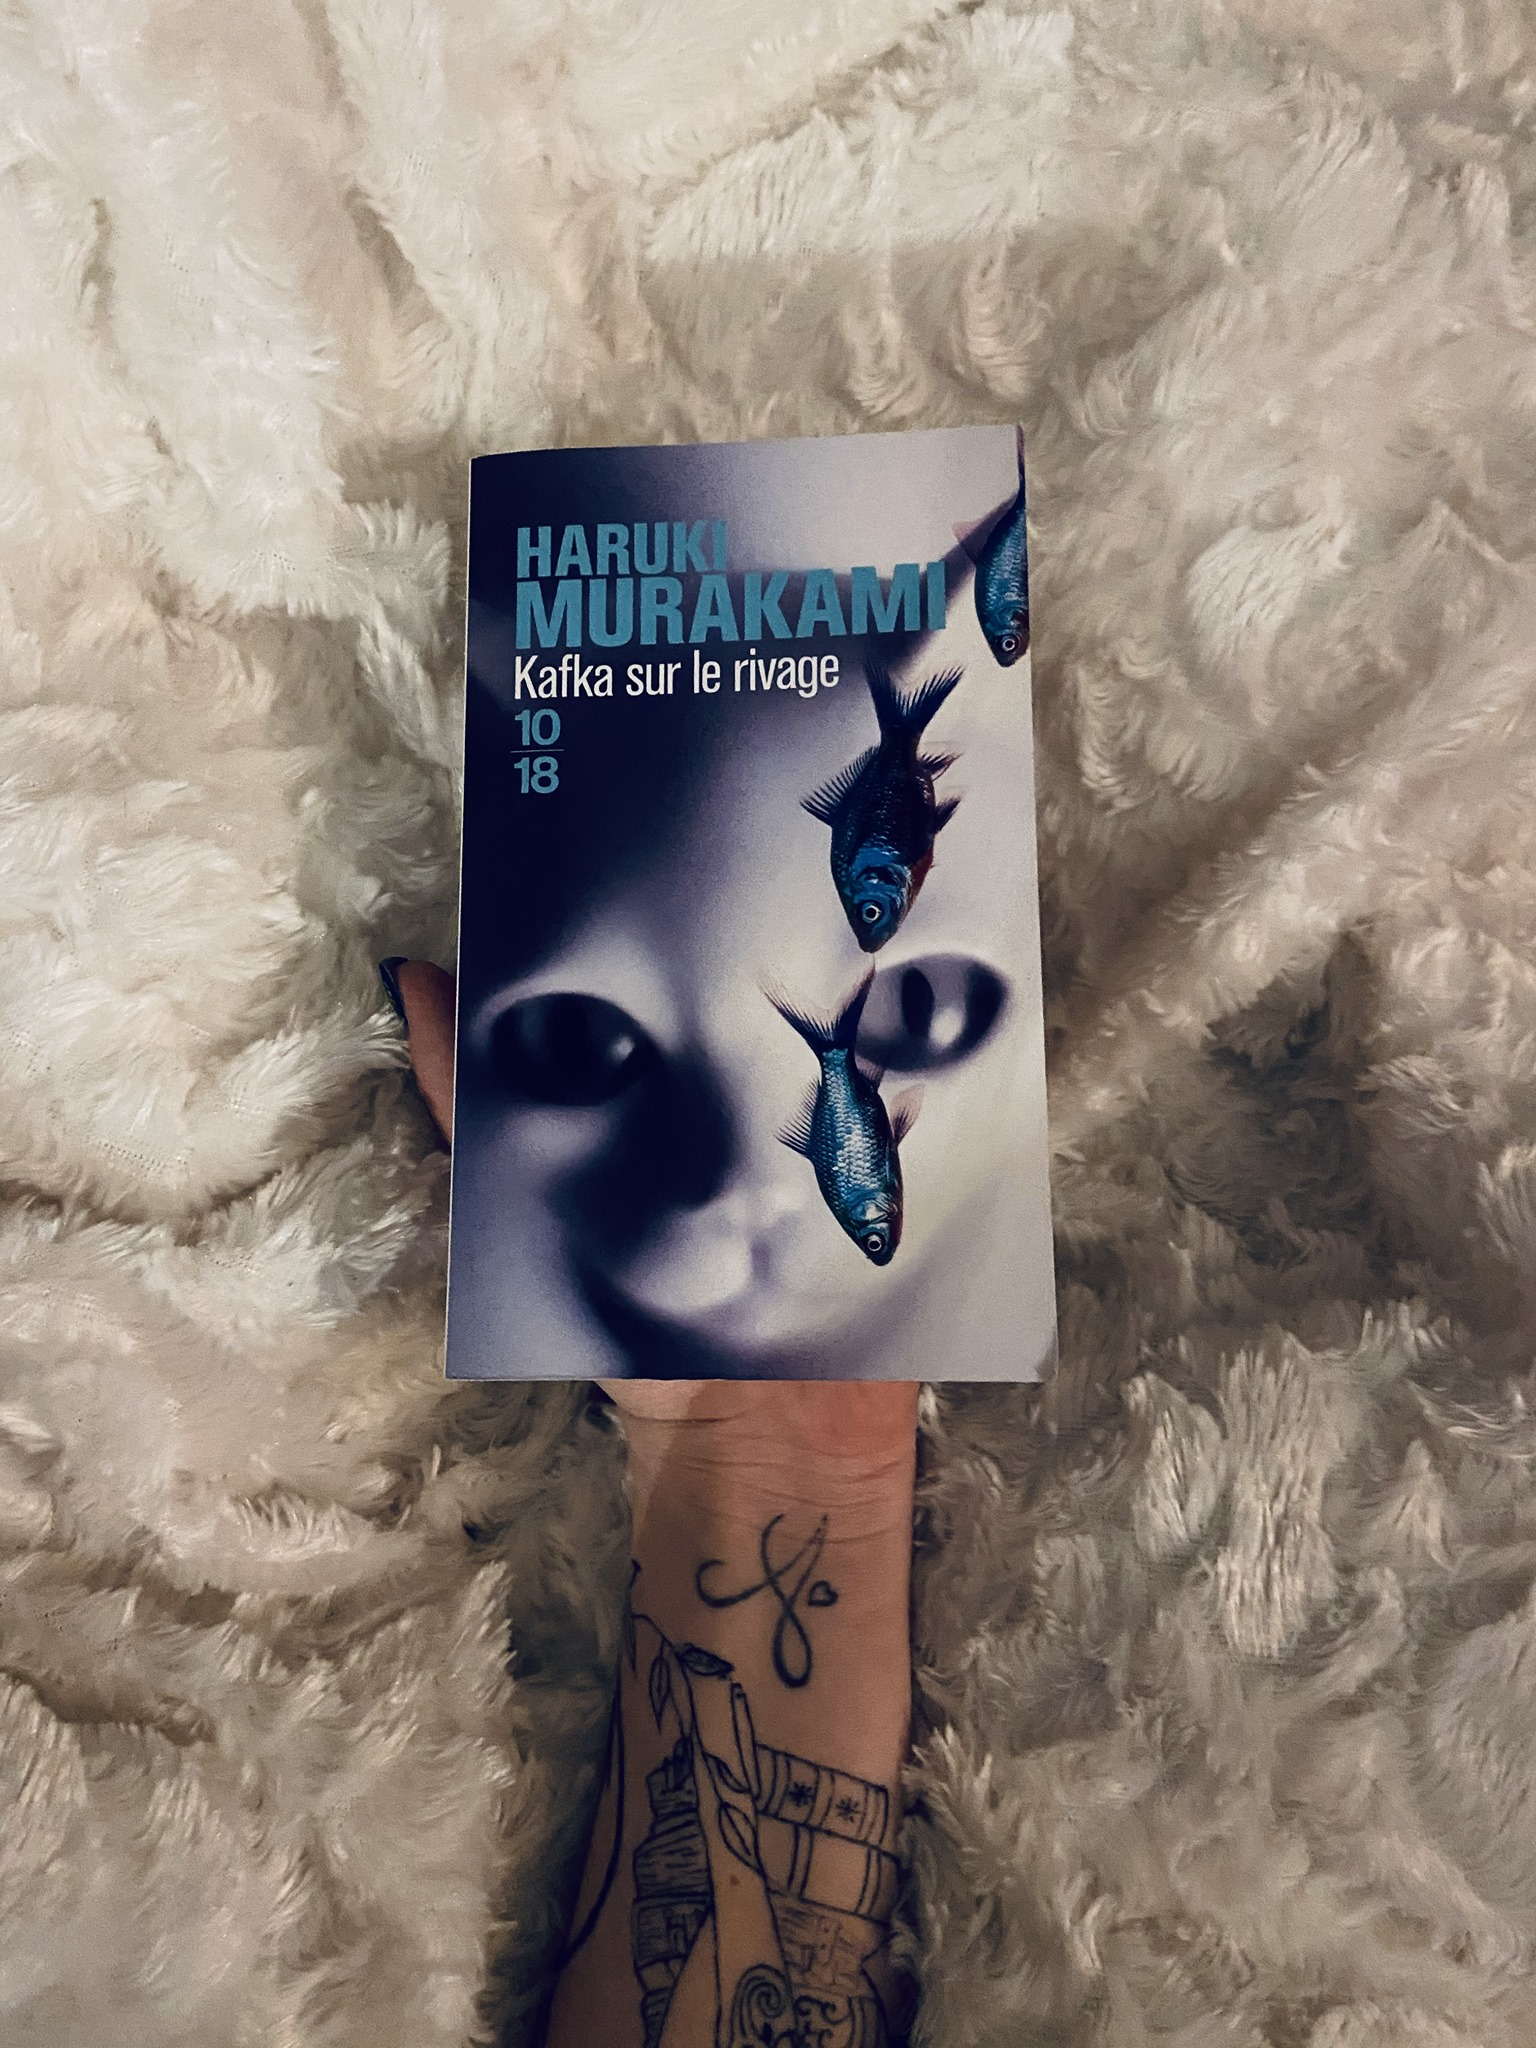 Lecture : Kafka sur le rivage – Haruki Murakami